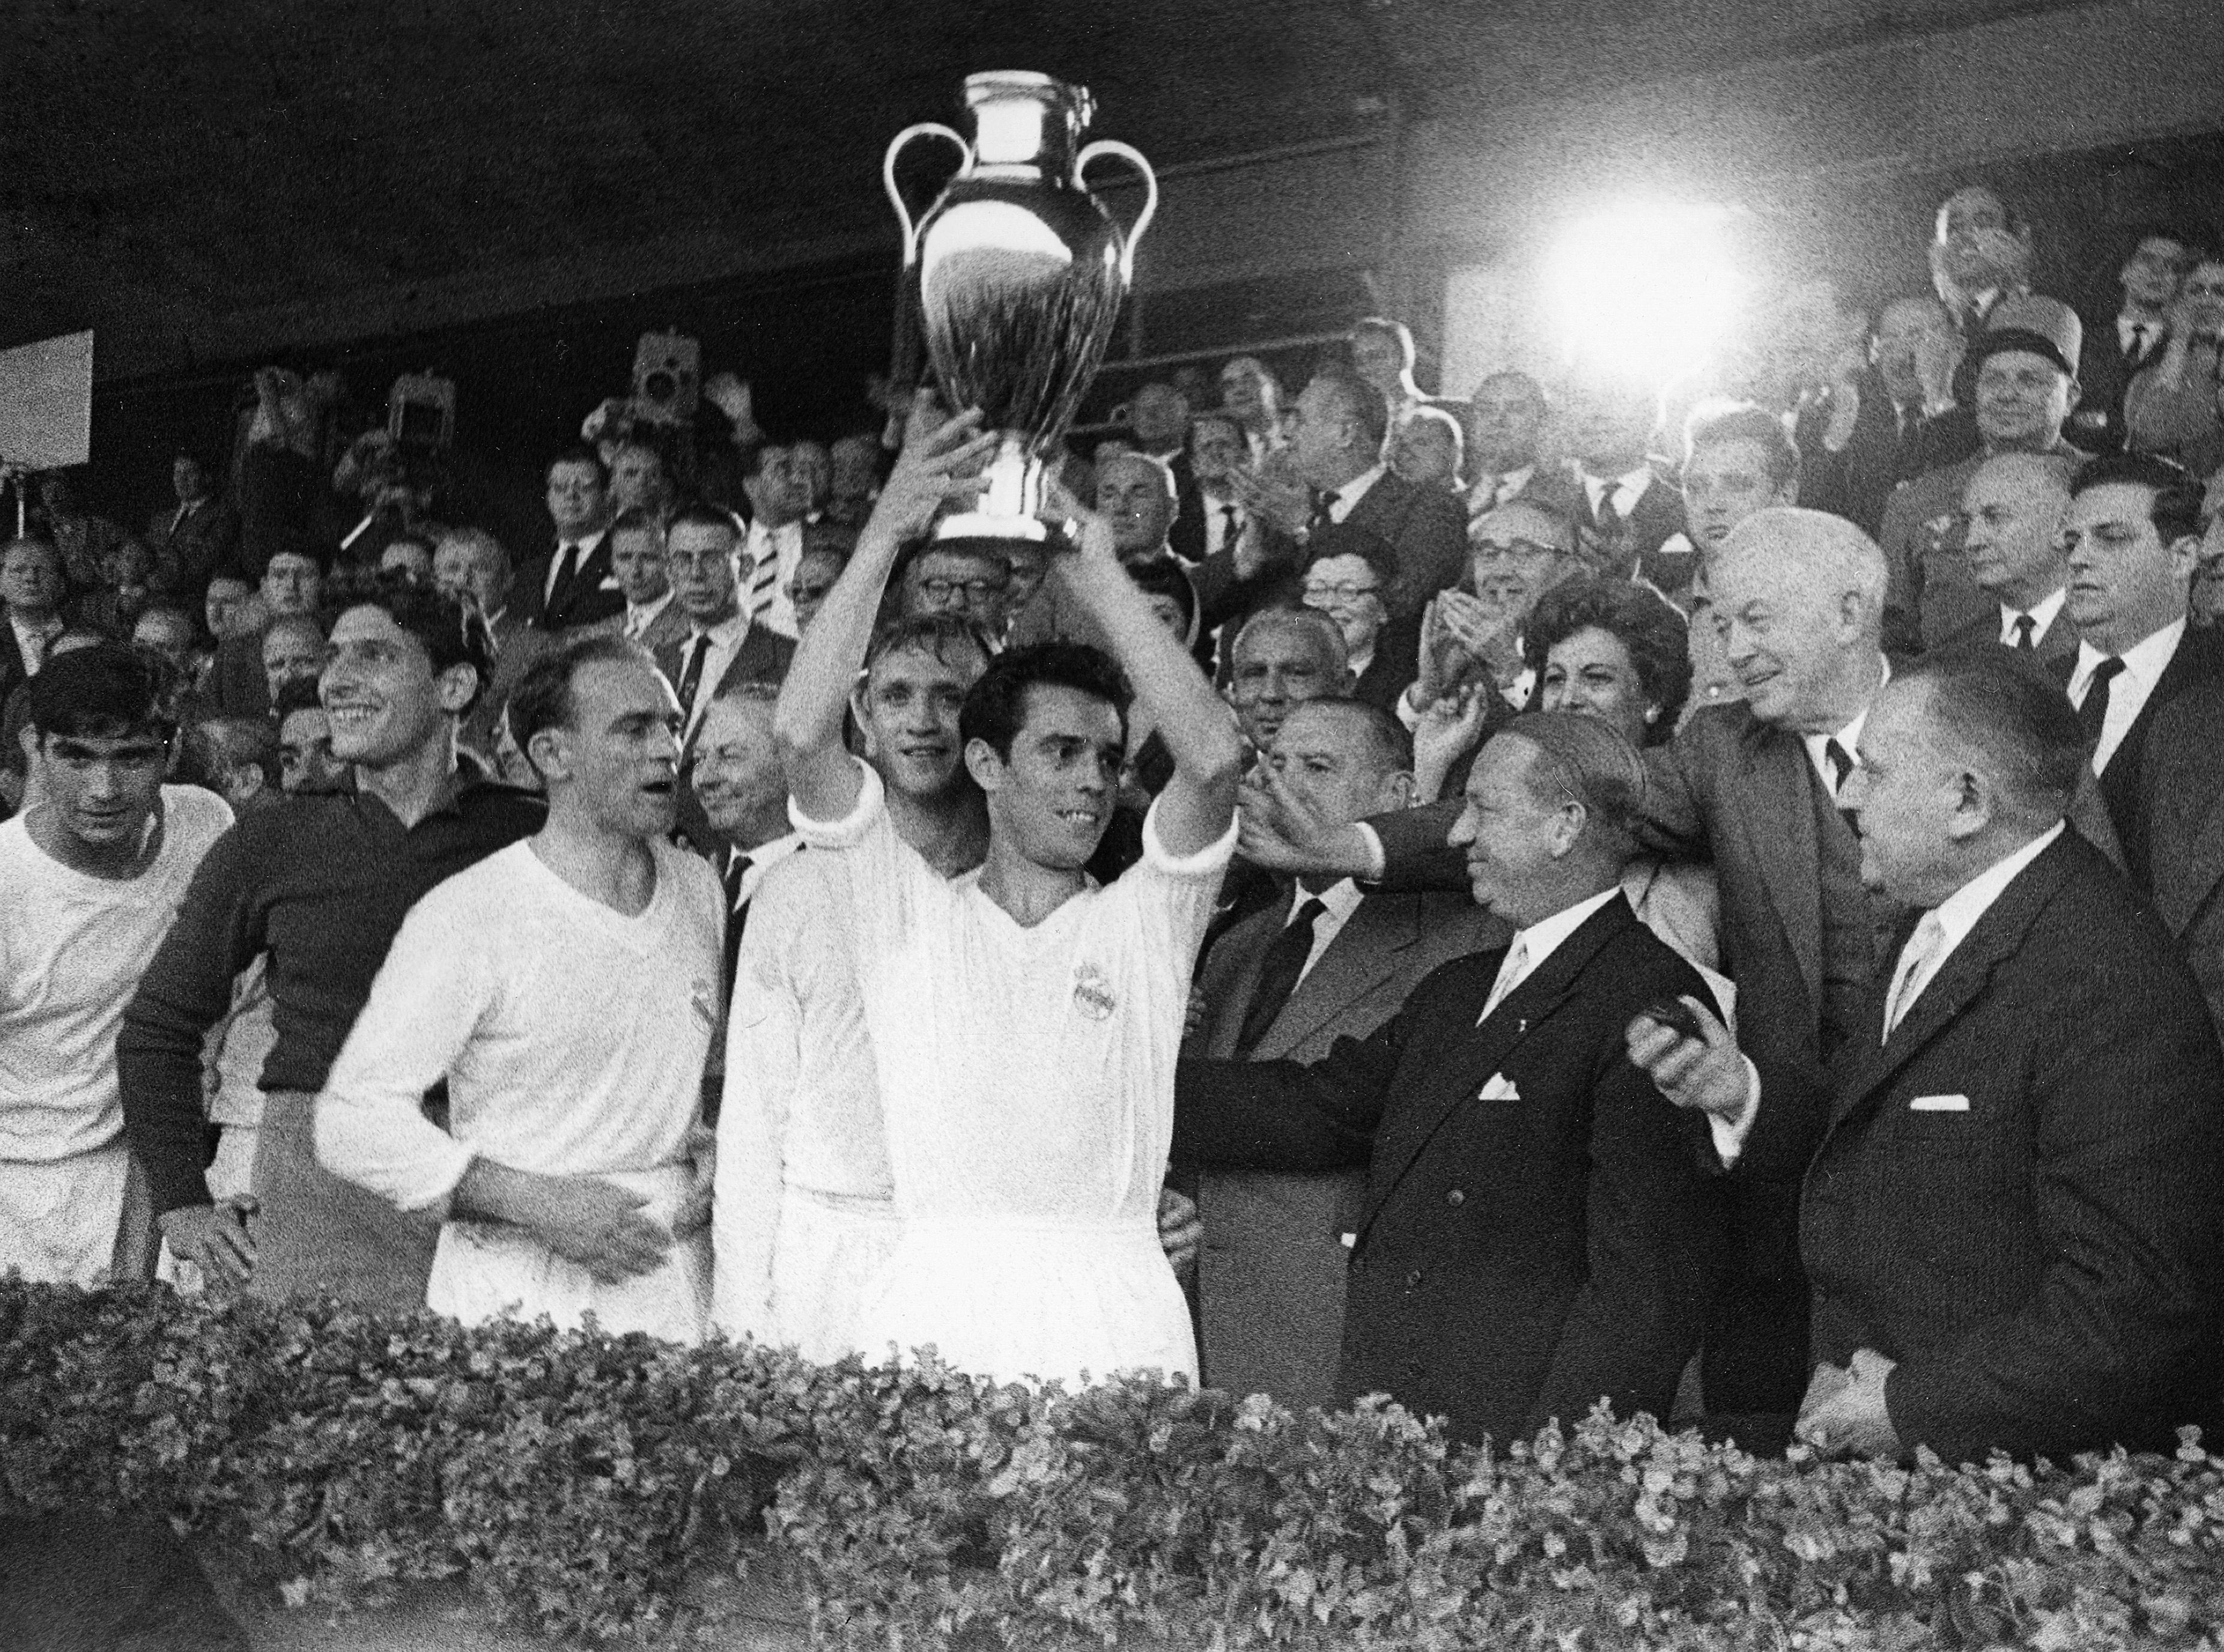 Fussball-Europapokal 1958 / 1959